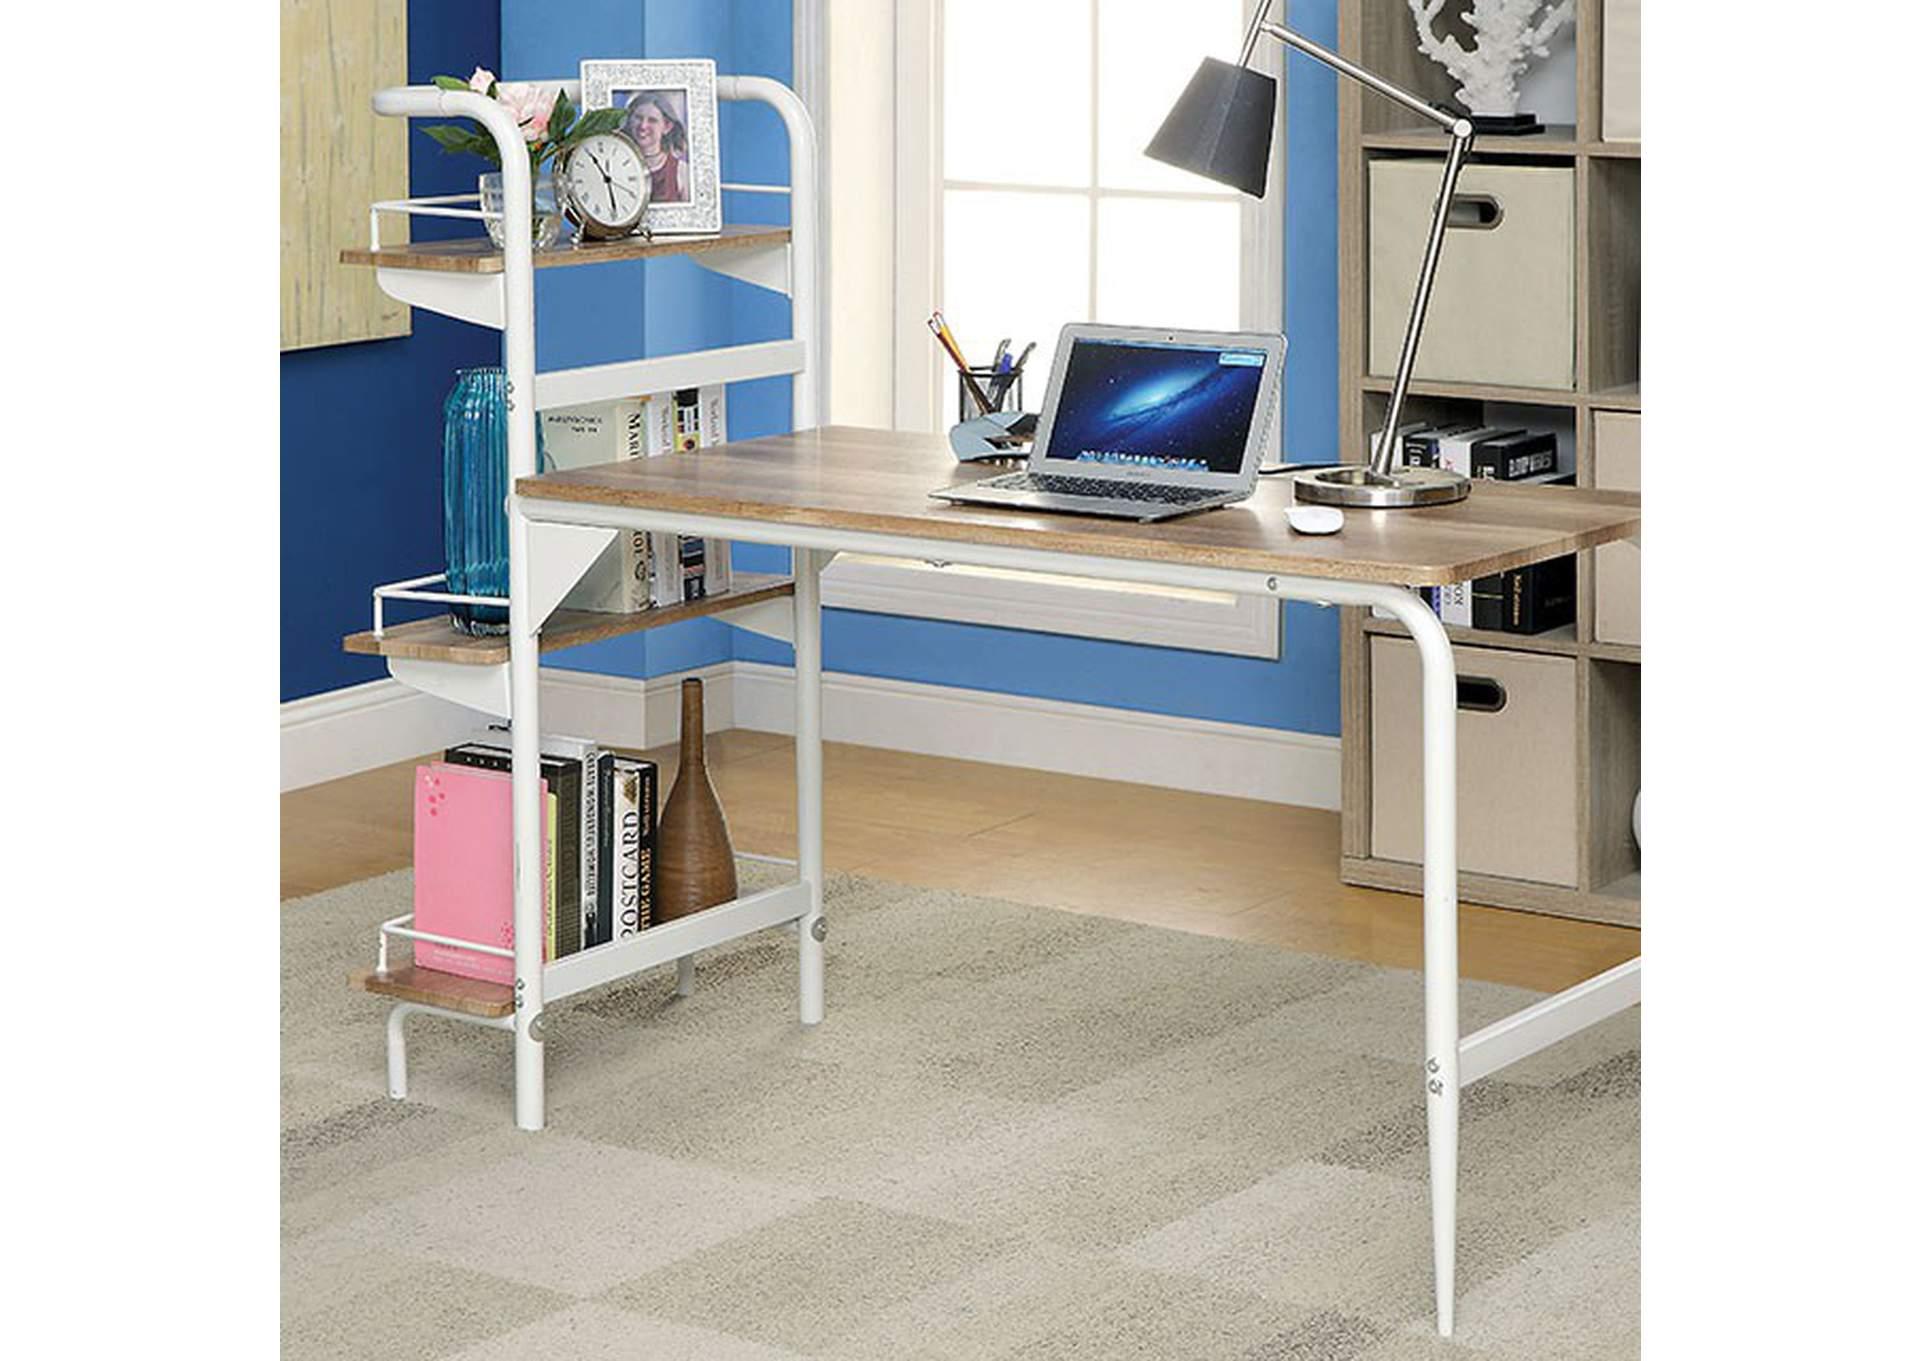 Darwish Furniture | New York City Ashley Furniture Dealer Maisy Chrome Computer  Desk W/Bookshelf